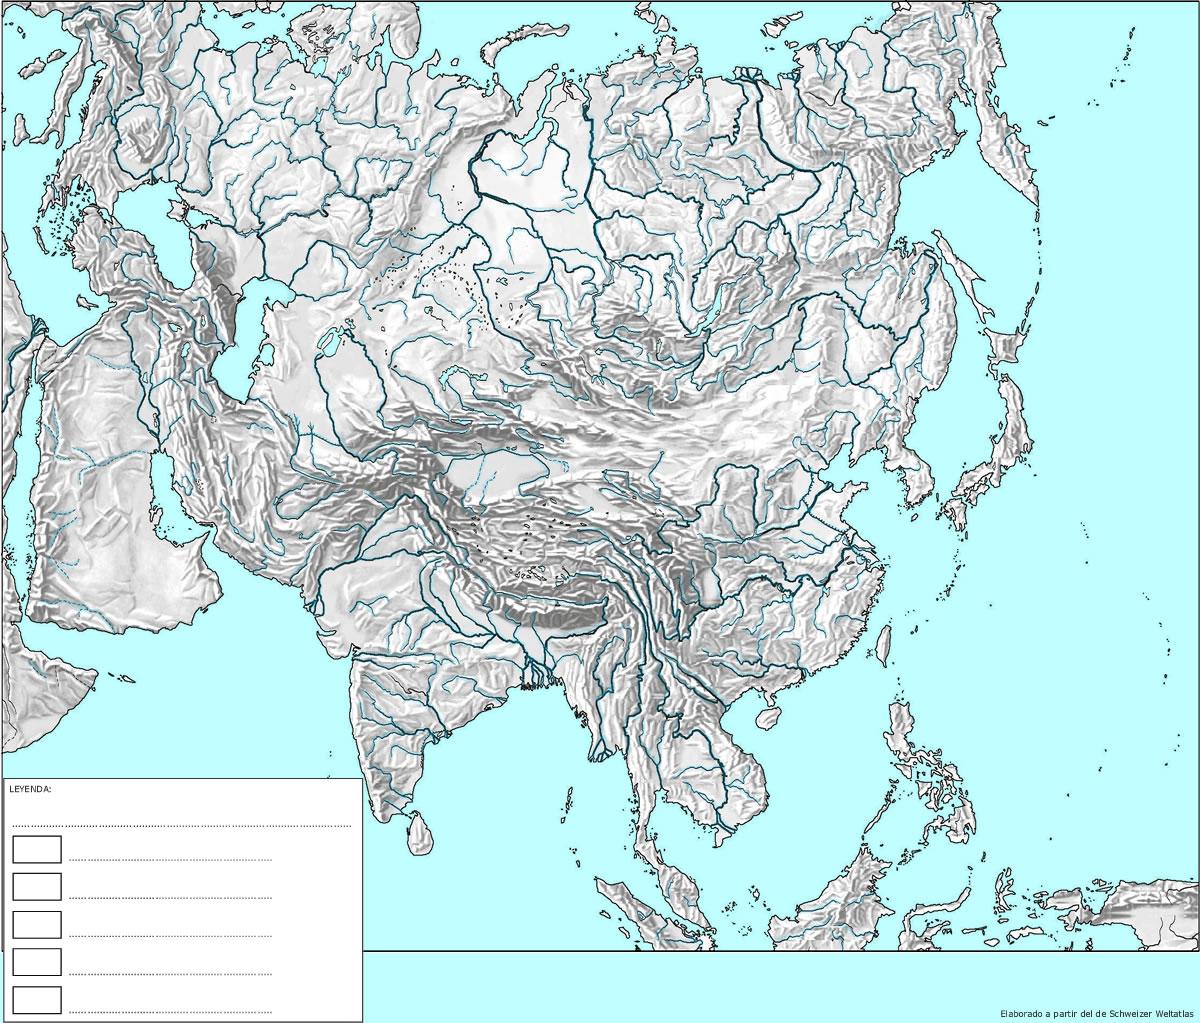 Worksheet. enclasedegeografia Ejercicio mapa fsico de Asia